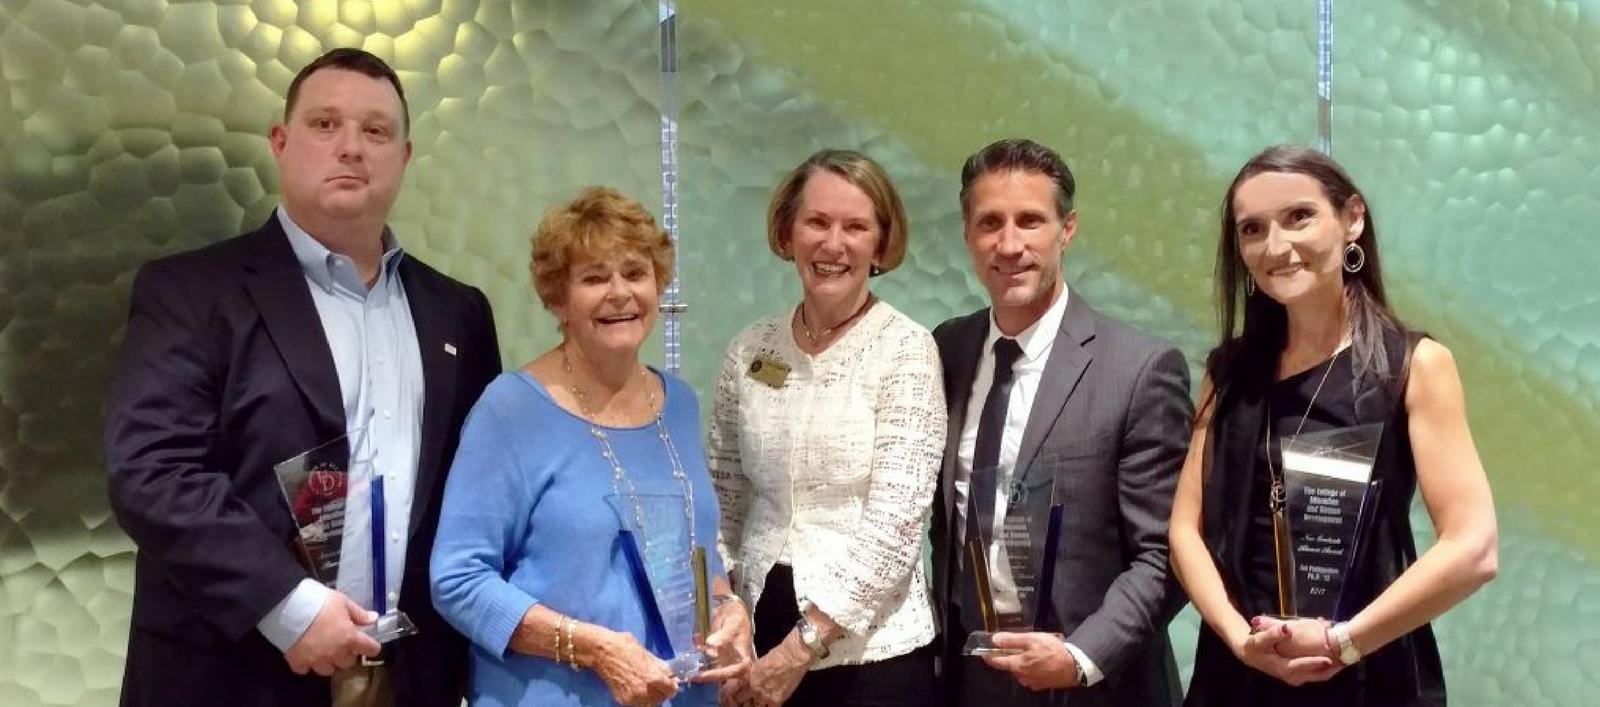 CEHD Alumni award recipients 2017